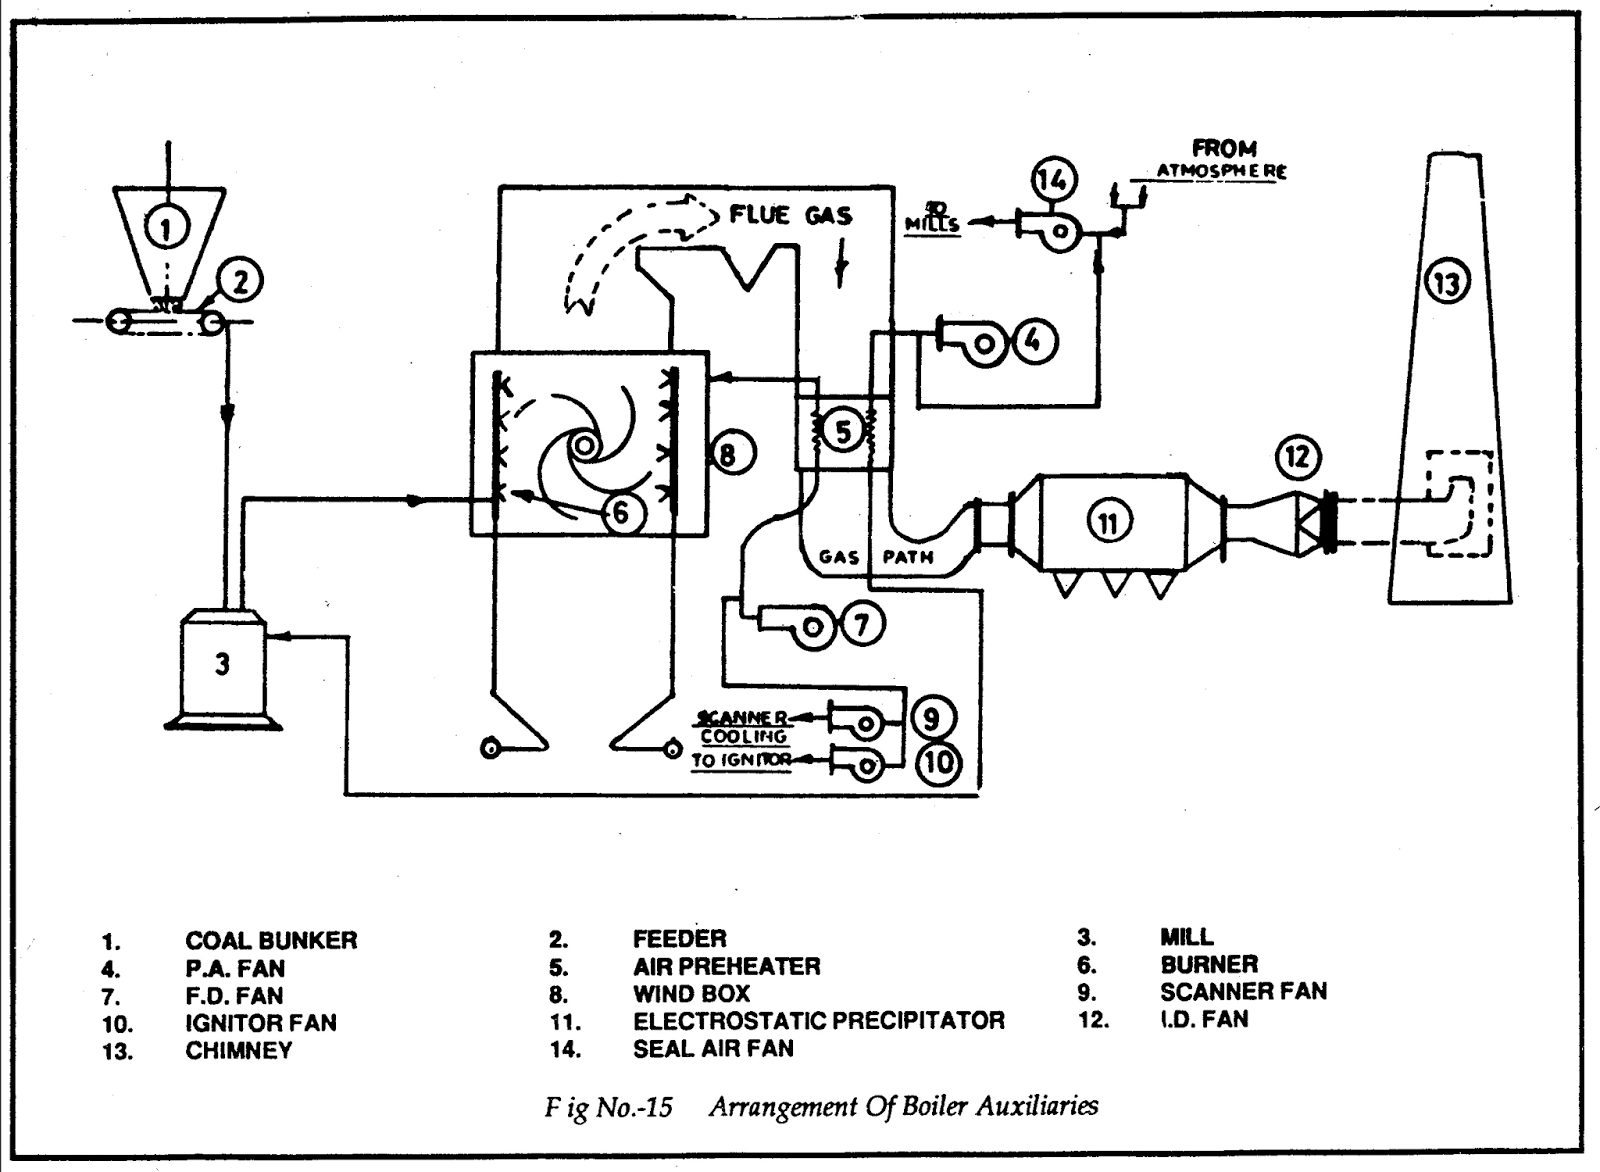 ALL ABOUT POWER PLANT: Boiler Auxiliaries: Arrangement Of Boiler Auxiliaries